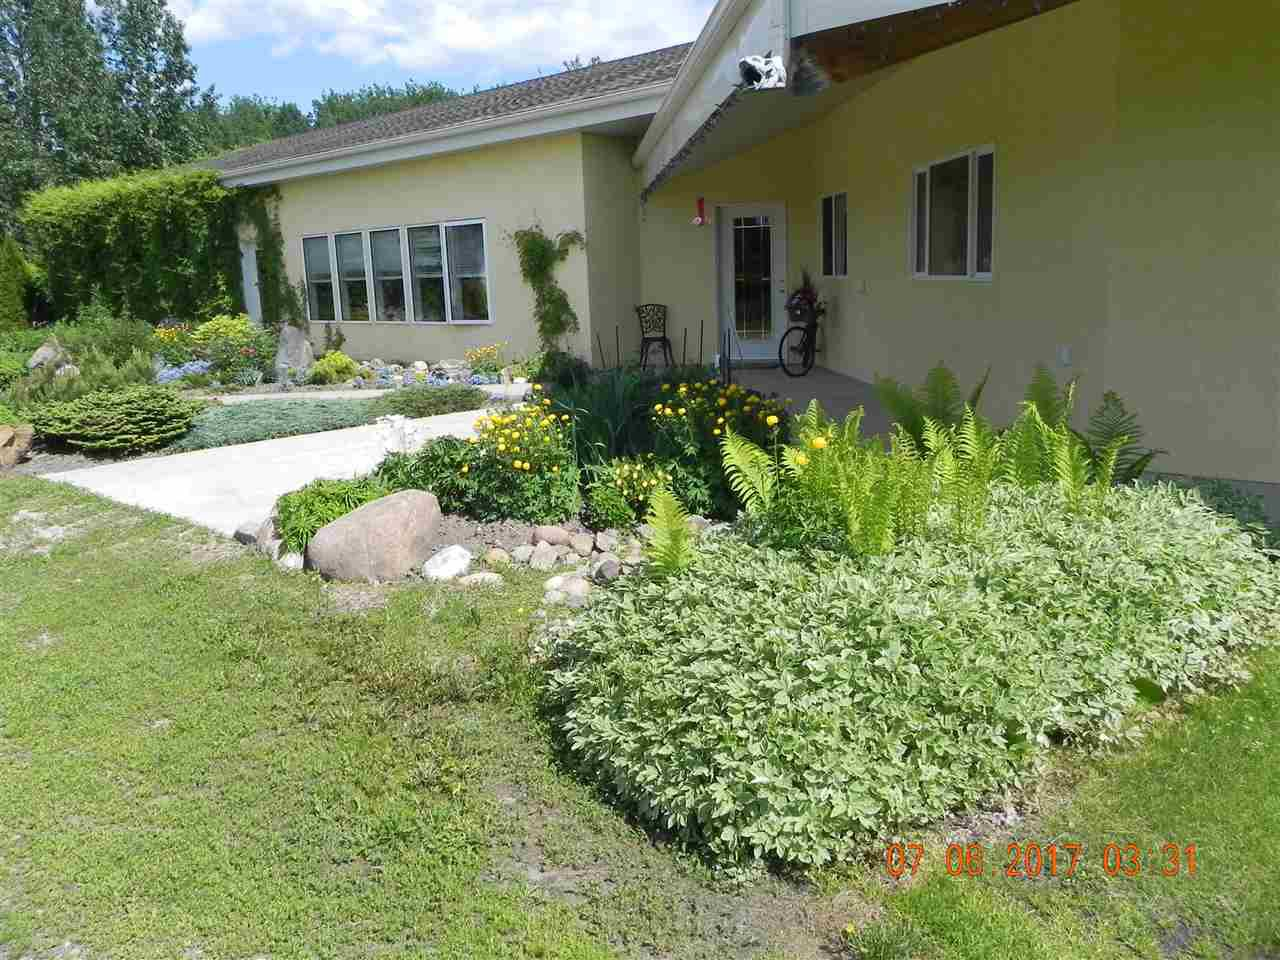 Main Photo: 662071 RGE RD 13: Rural Lesser Slave River M.D. House for sale : MLS®# E4148237